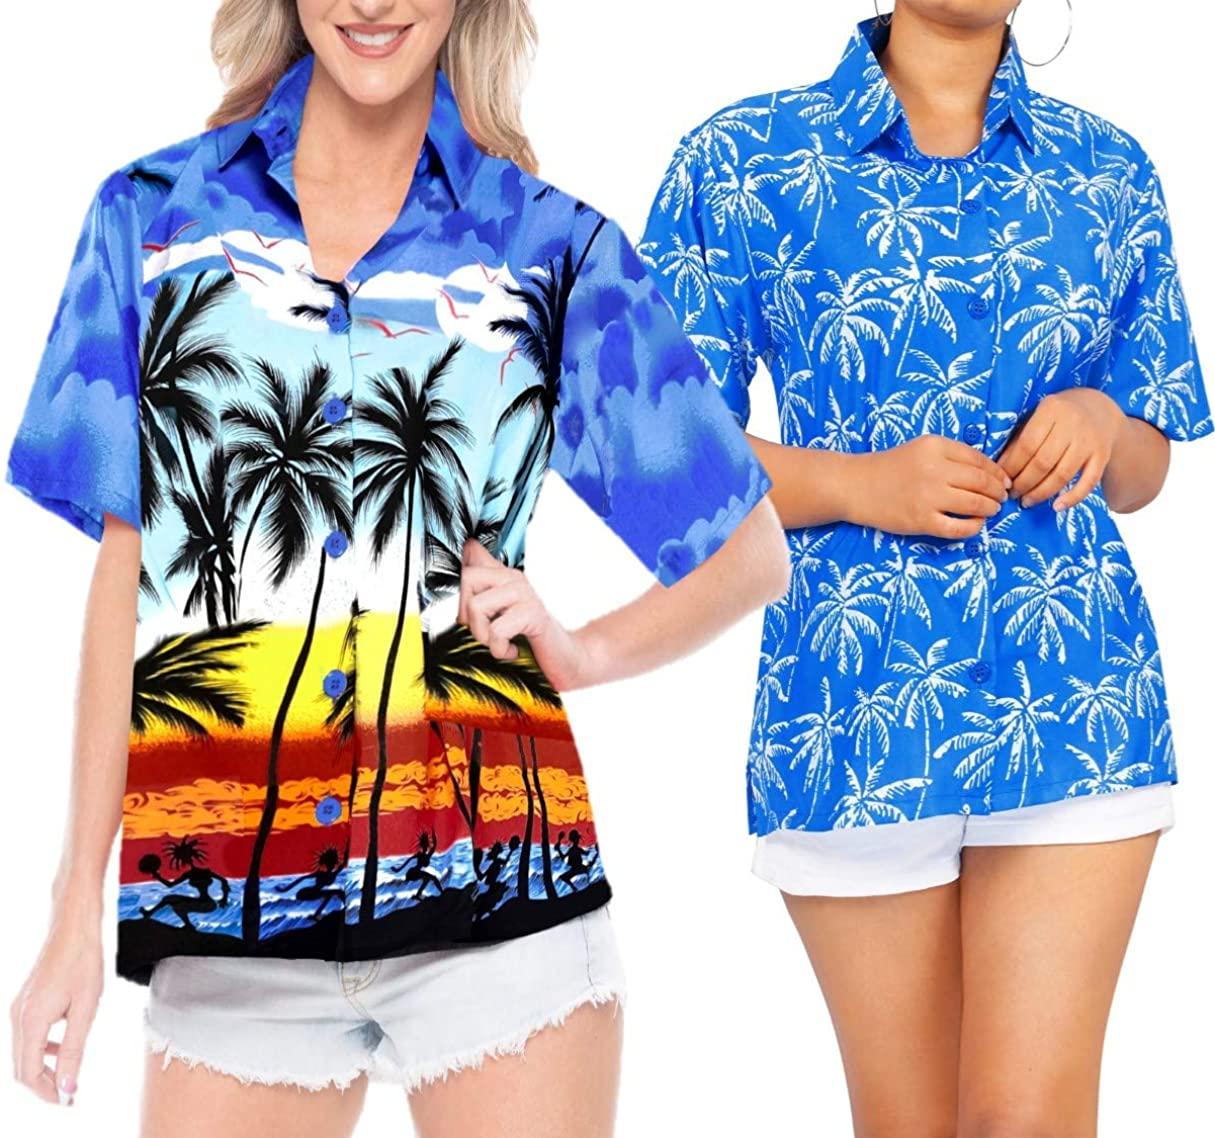 LA LEELA Women's Swim Hawaiian Shirt Short Sleeve Button Down Shirt Work from Home Clothes Women Beach Shirt Blouse Shirt Combo Pack of 2 Size S